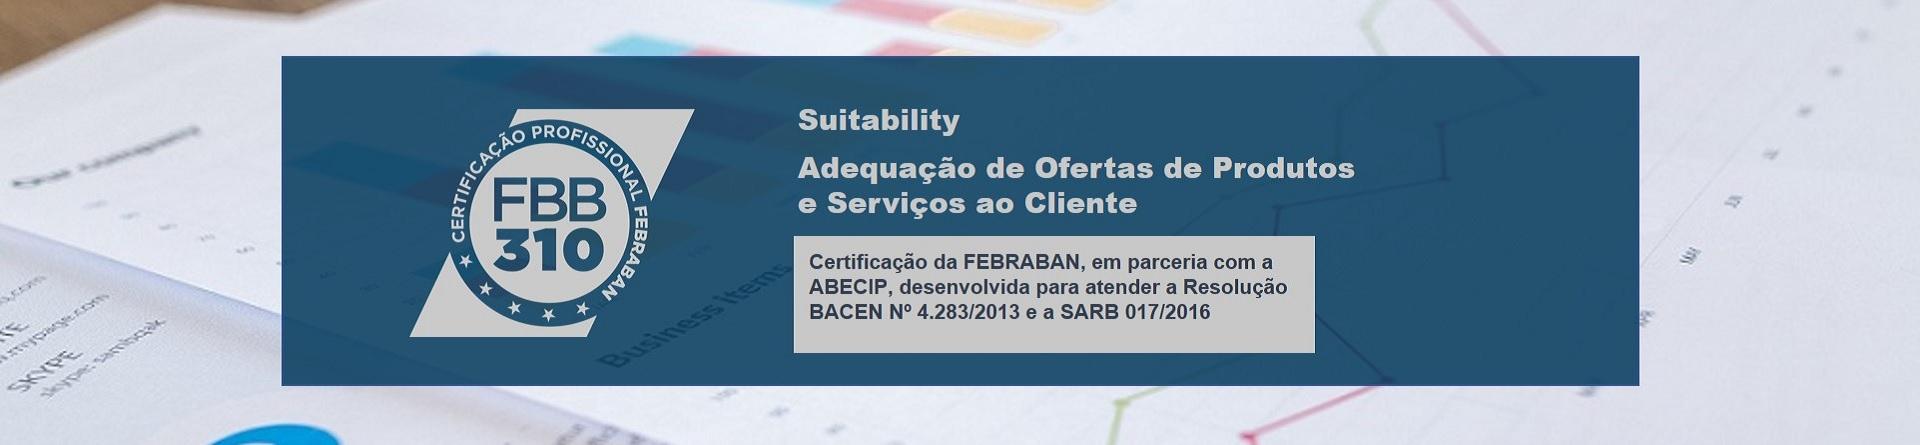 CertificaçãoAbecip-Febraban